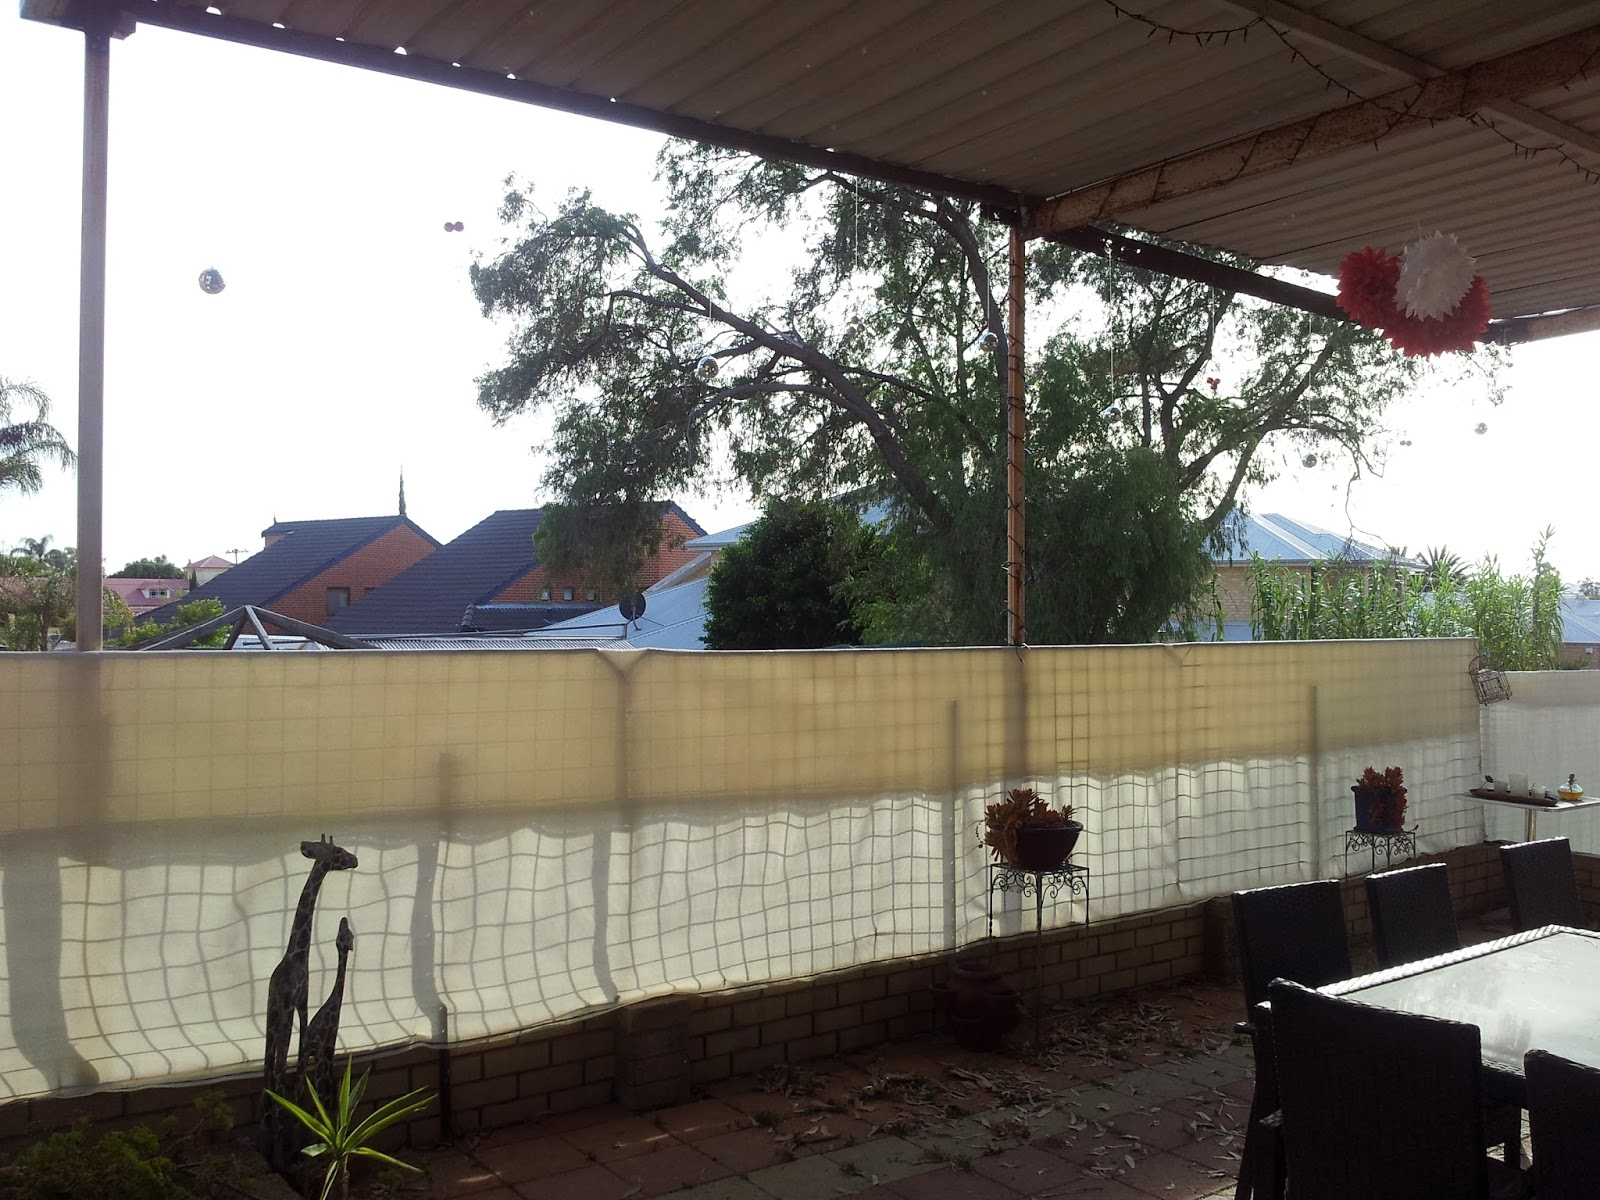 jarrah jungle clearing the backyard and reno rubble